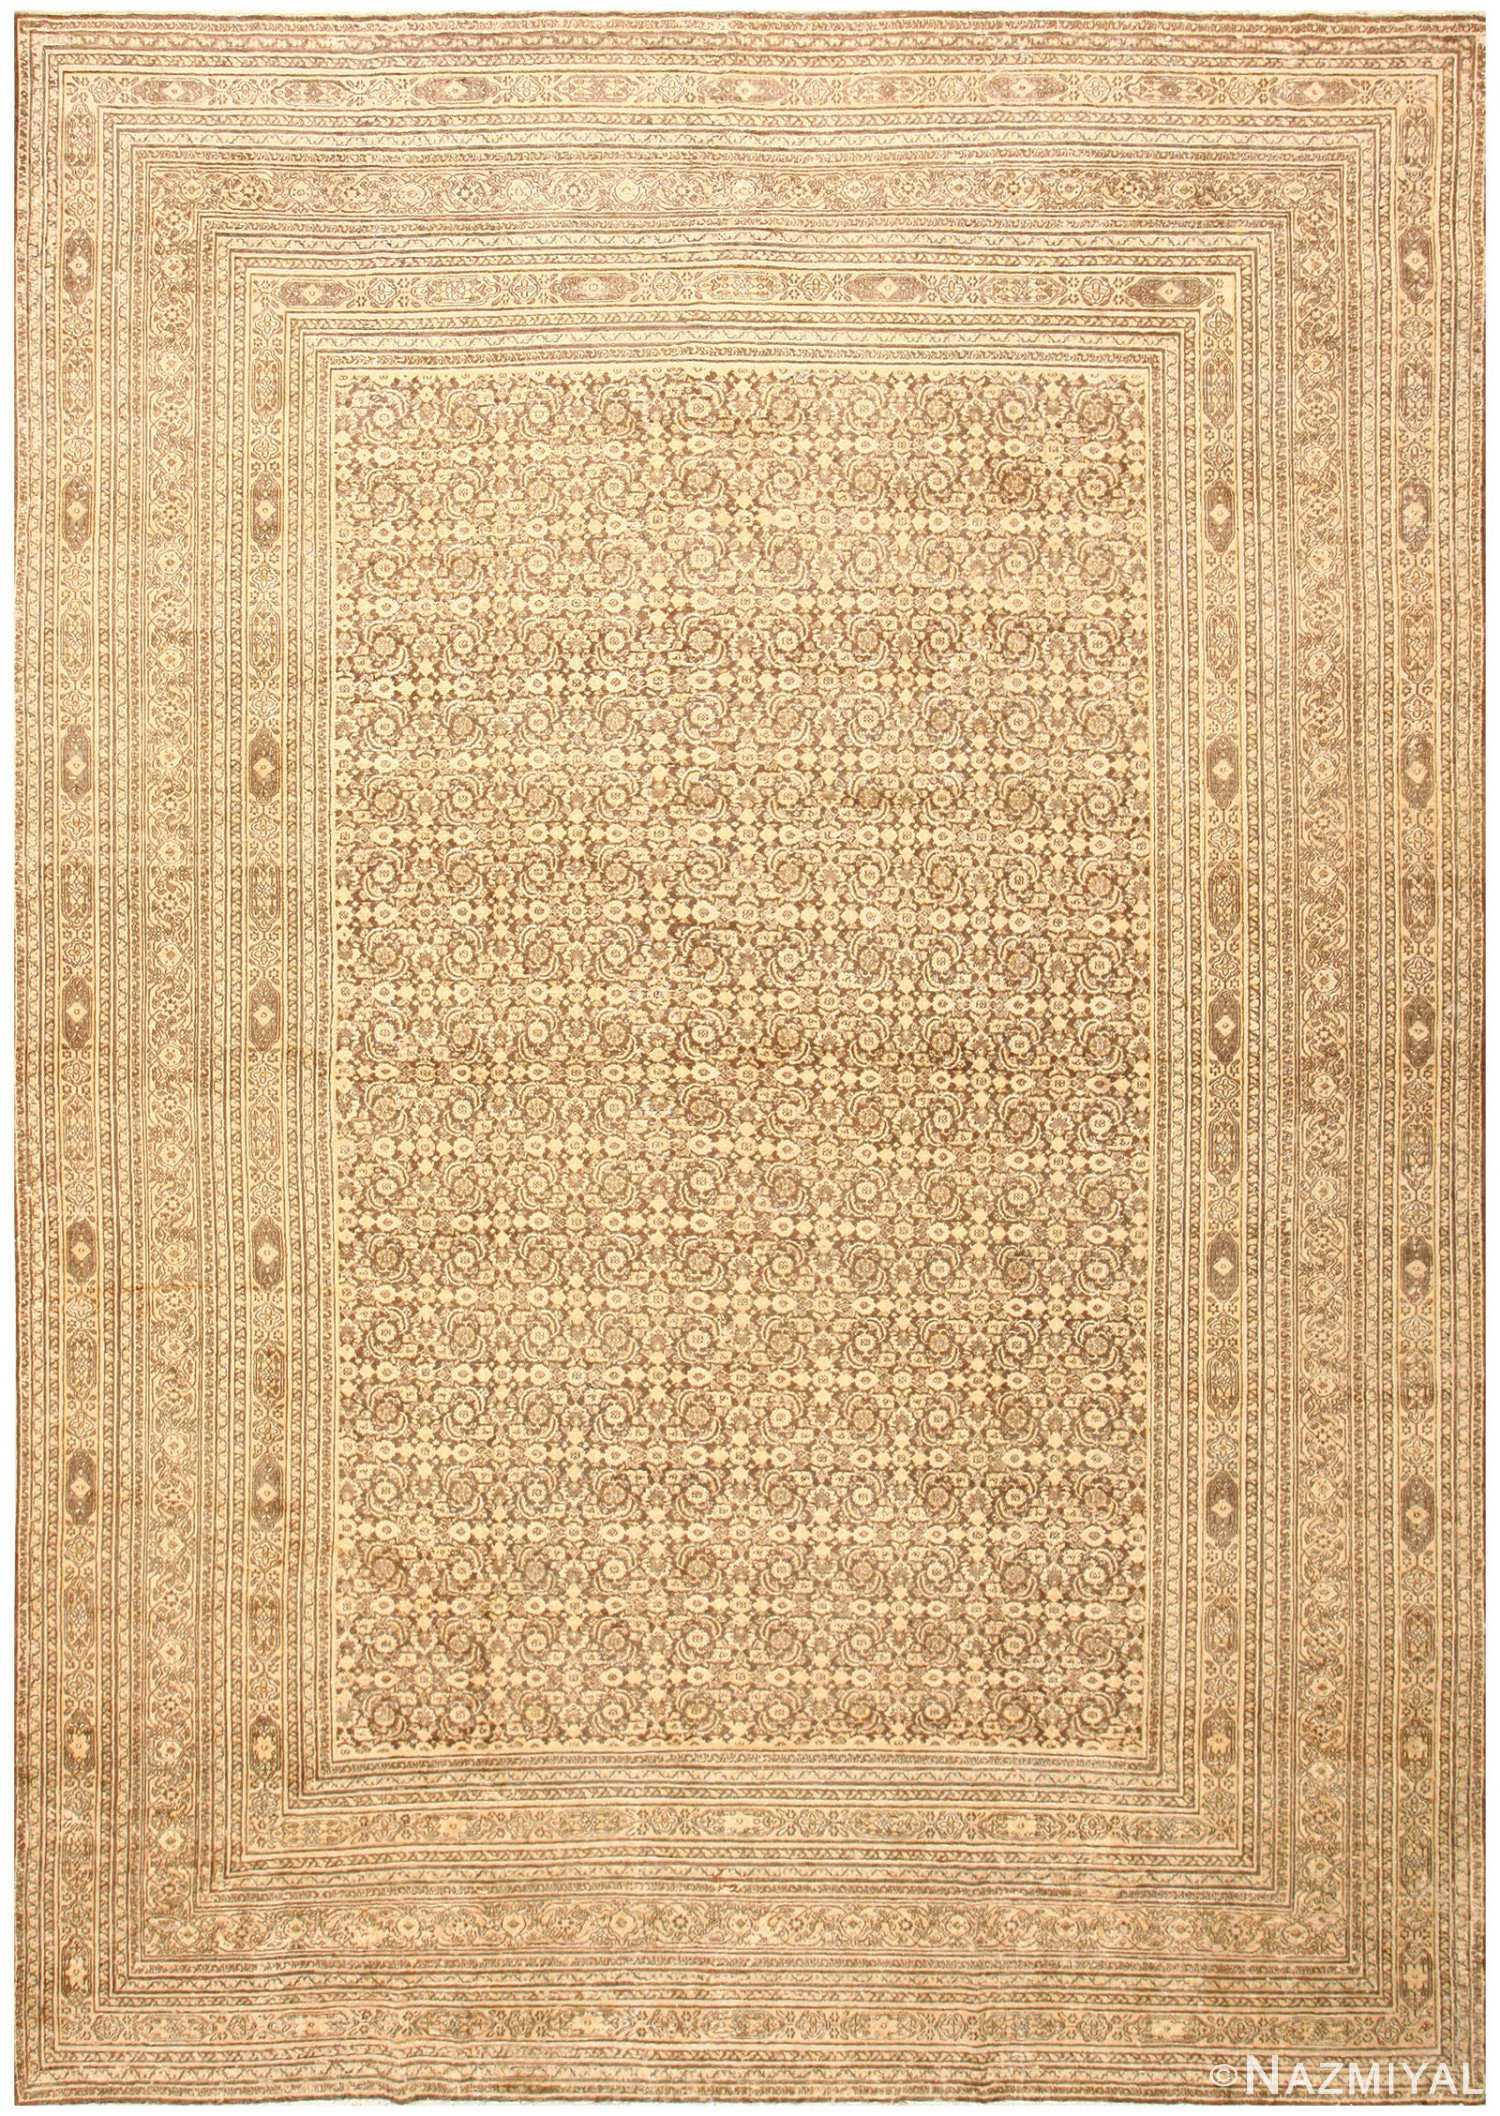 Antique Persian Khorassan Rug 50426 Nazmiyal